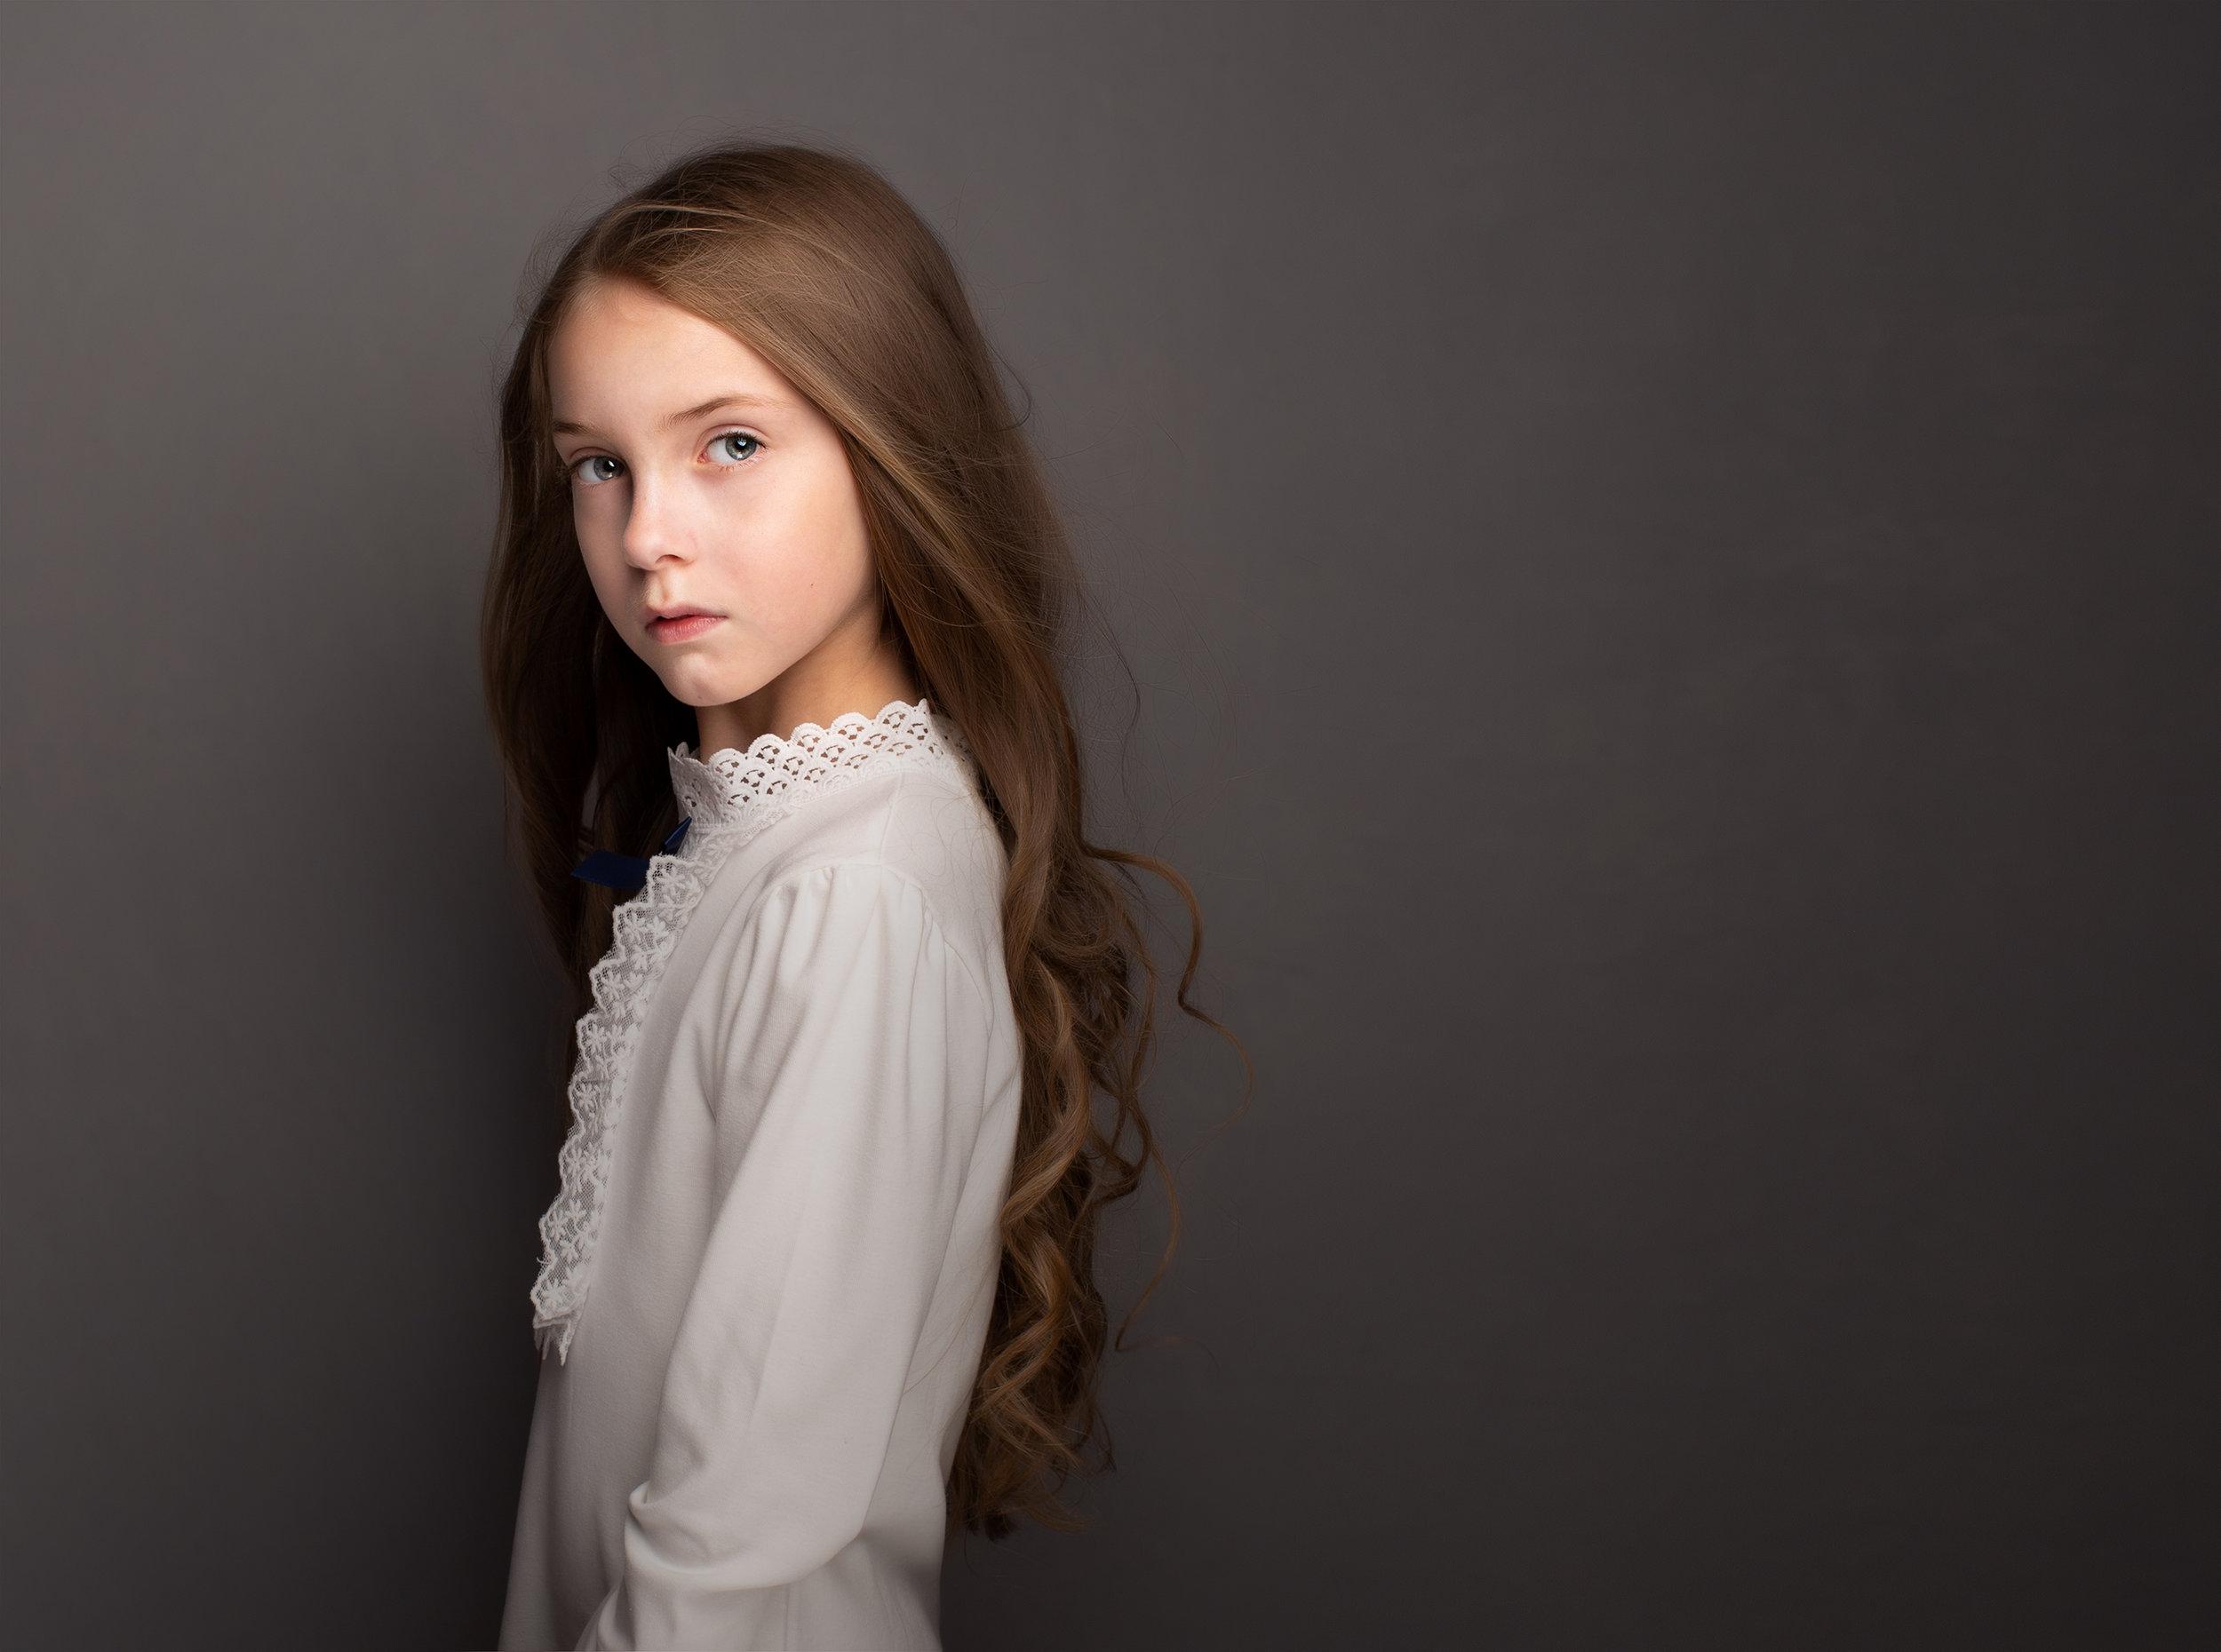 elizabethg_fineart_portrait_photography_eva_004.jpg